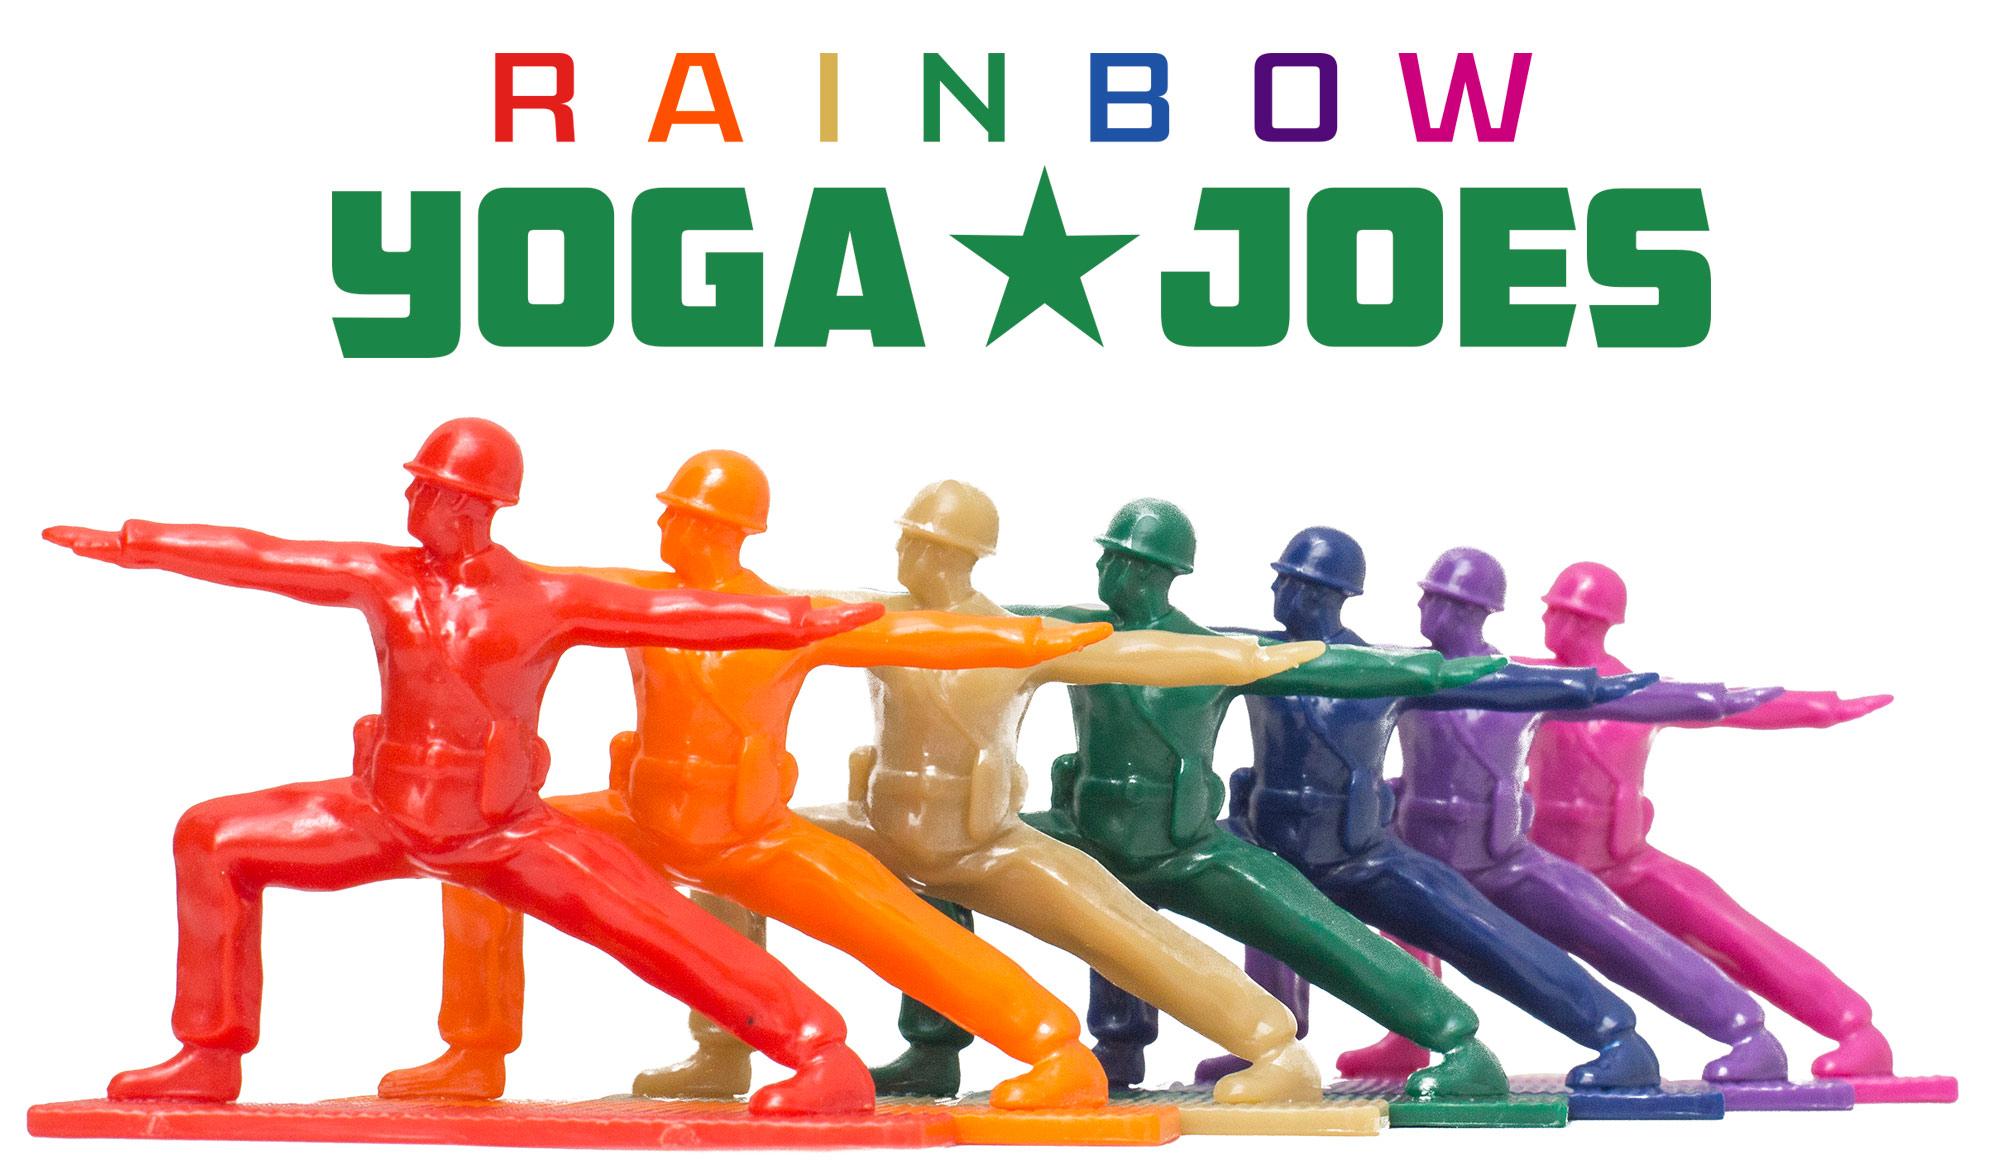 RainbowWarriors_andlogo_DA2.jpg